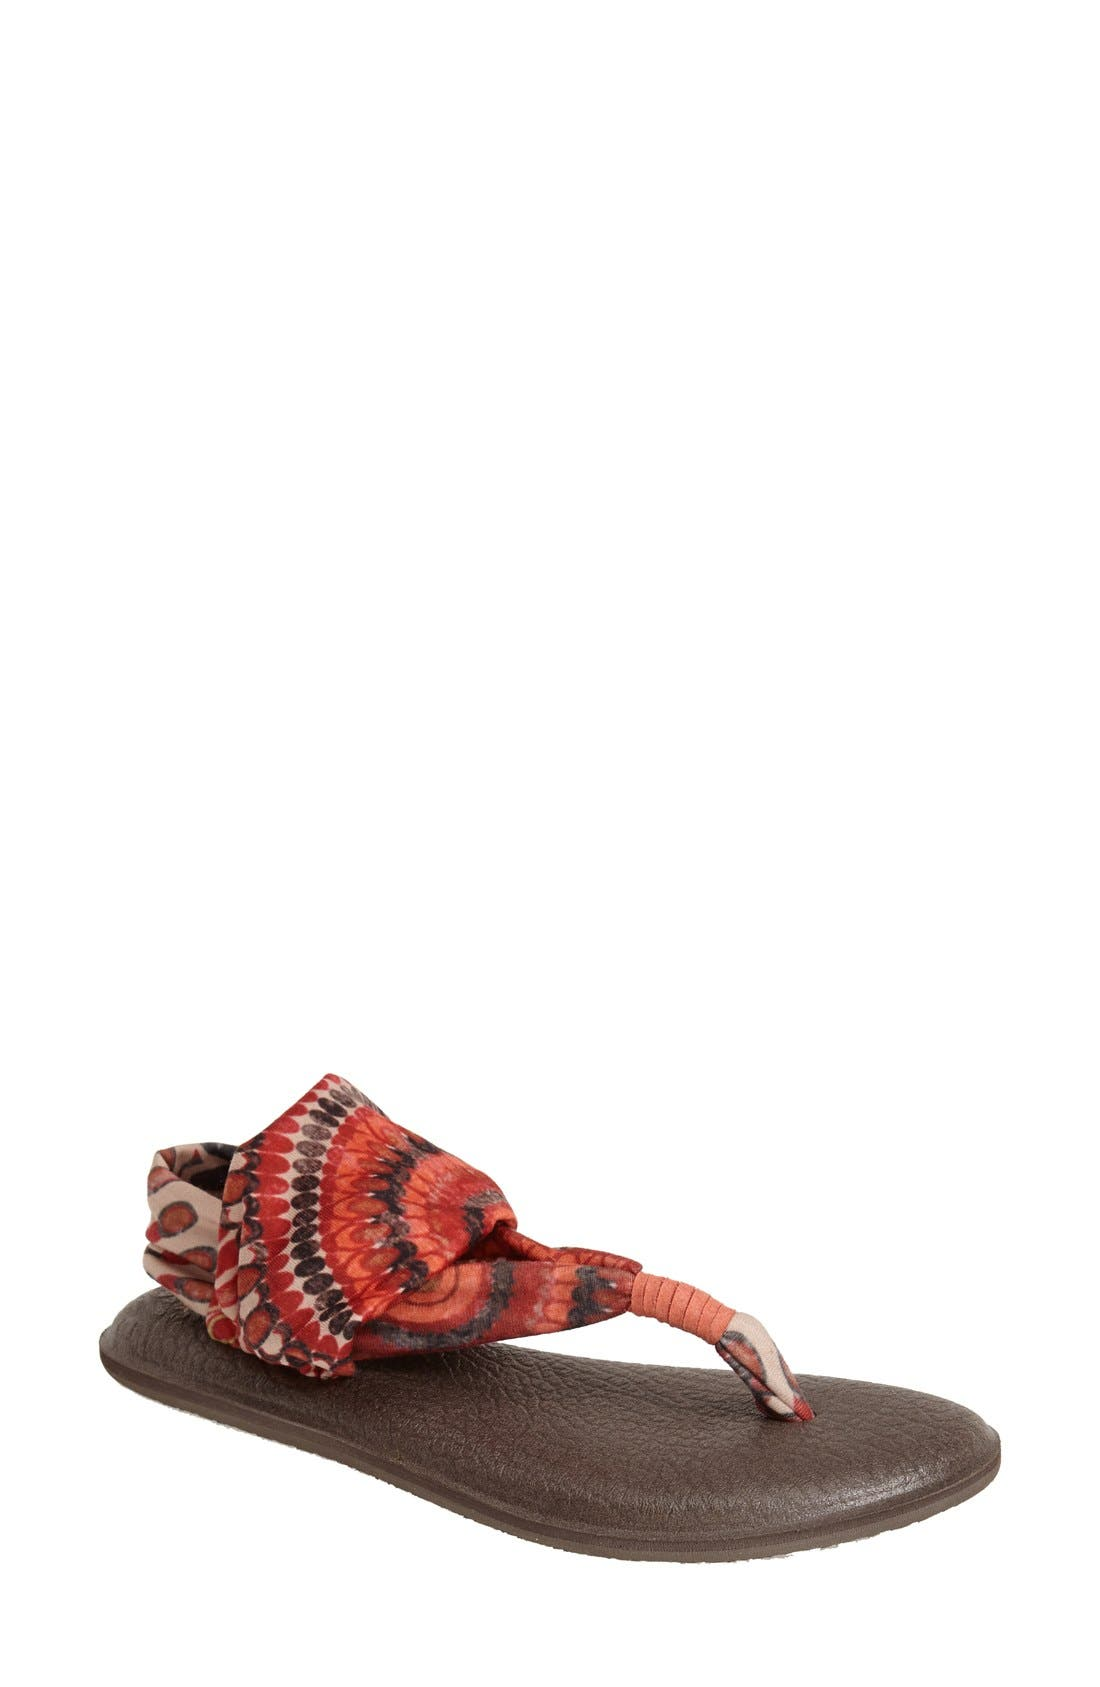 'Yoga Sling 2' Sandal,                             Main thumbnail 26, color,